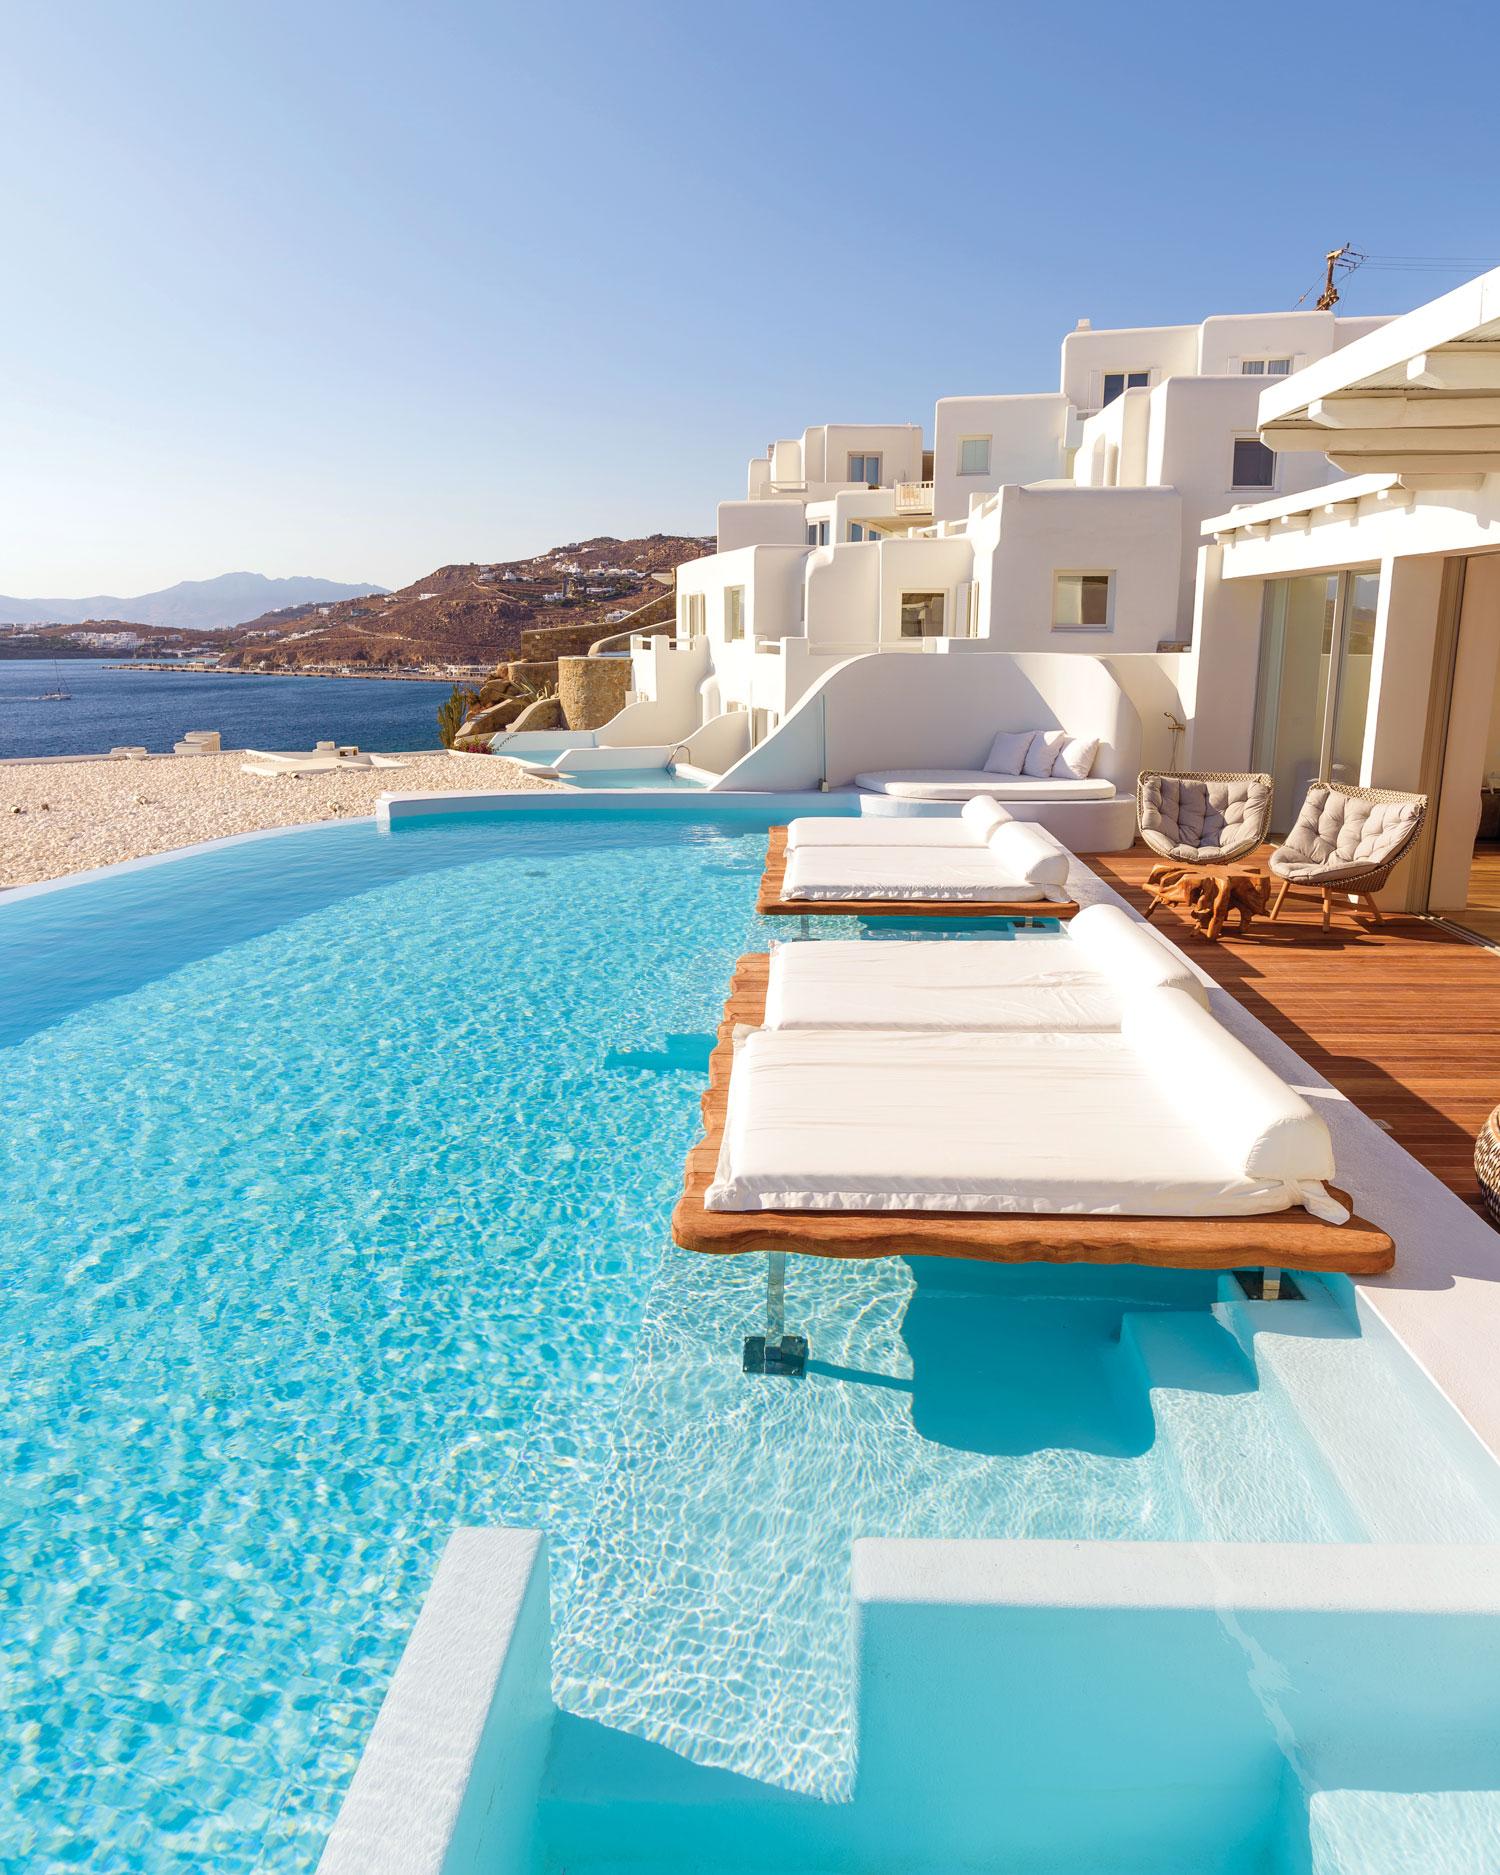 Zena Foster and Durrell Tank Babbs honeymoon vacation cavo tagoo mykonos greece